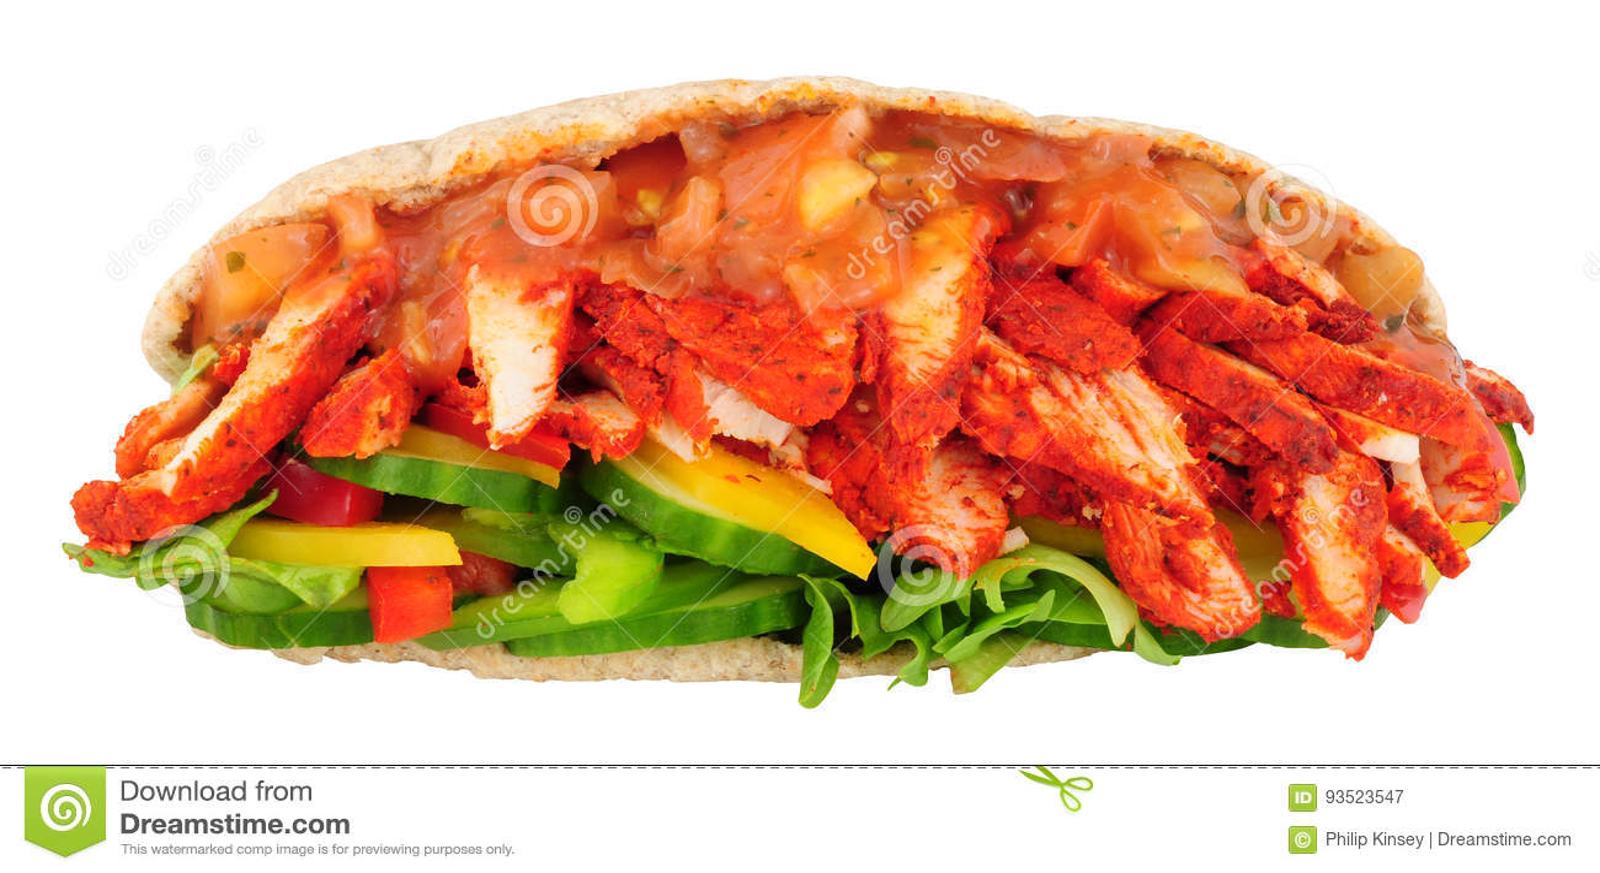 Tandoori Chicken Pitta Bread Sandwich